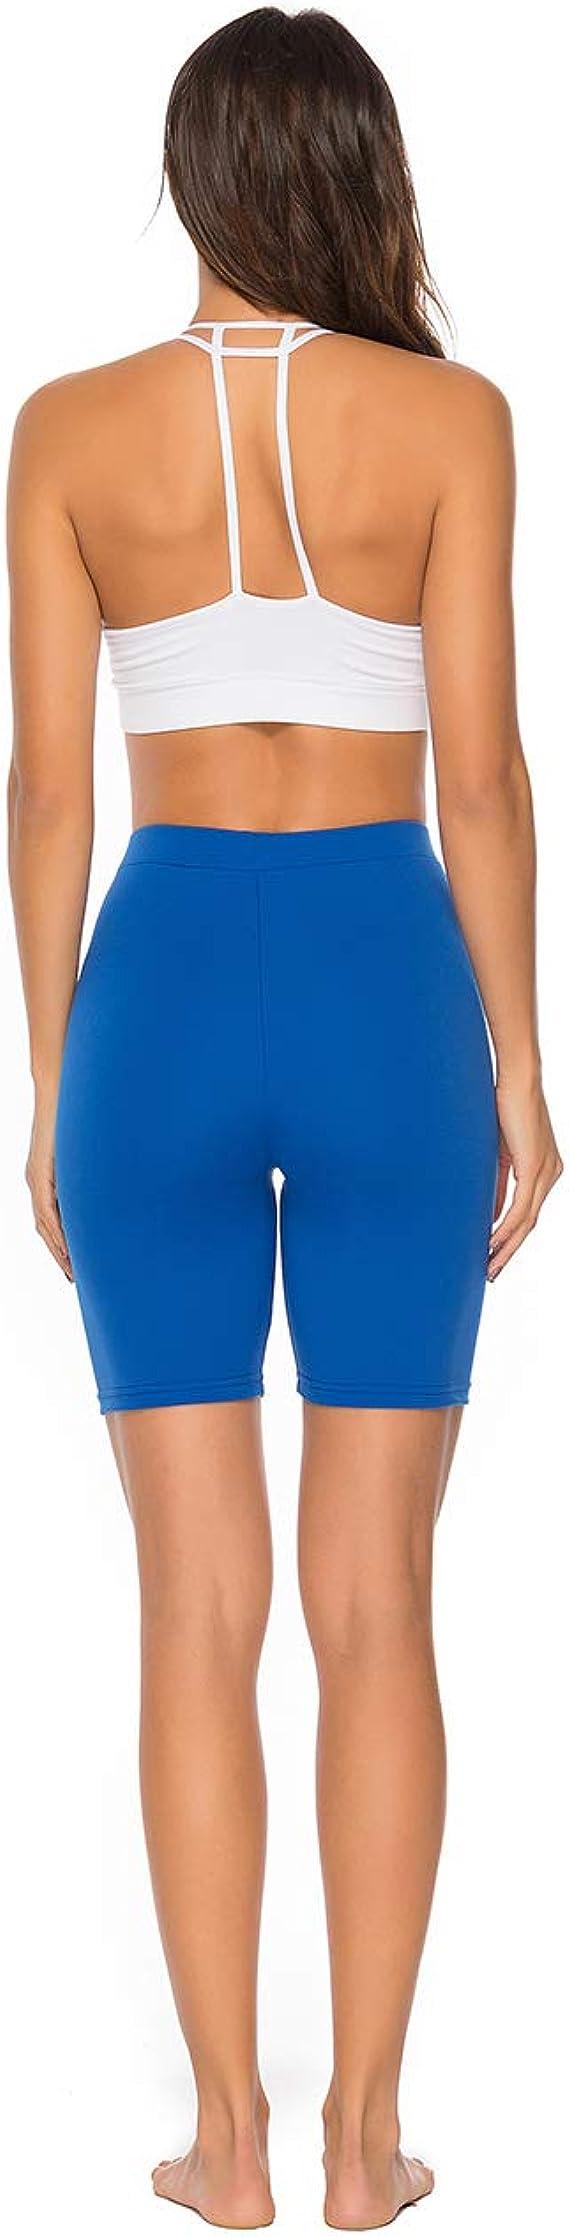 RIOJOY Women/'s Cycling Gym Running Yoga Shorts 1//2 Length Over-Knee Shorts Active Sport Casual Pants